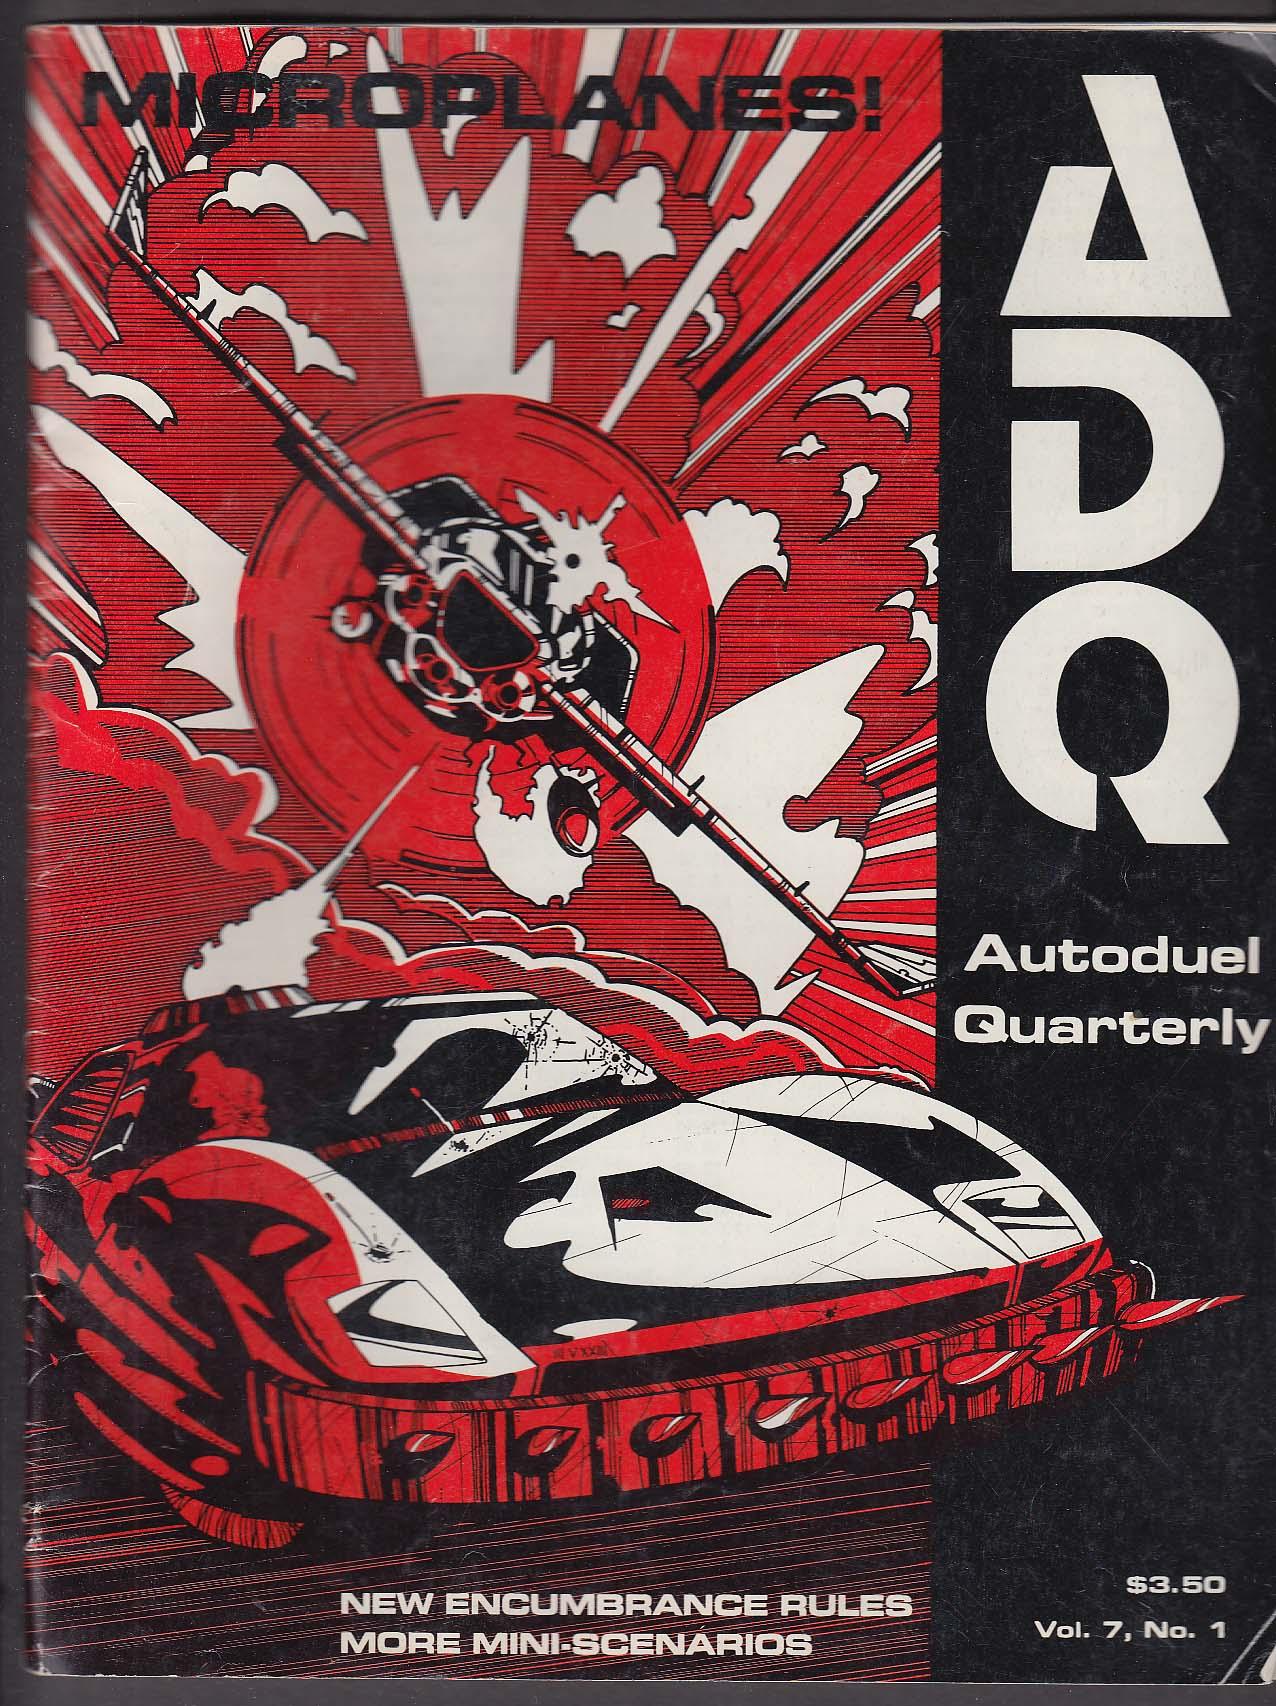 ADQ Autoduel Quarterly Vol 7 #1 Car Wars Steve Jackson Games 1989 RPG